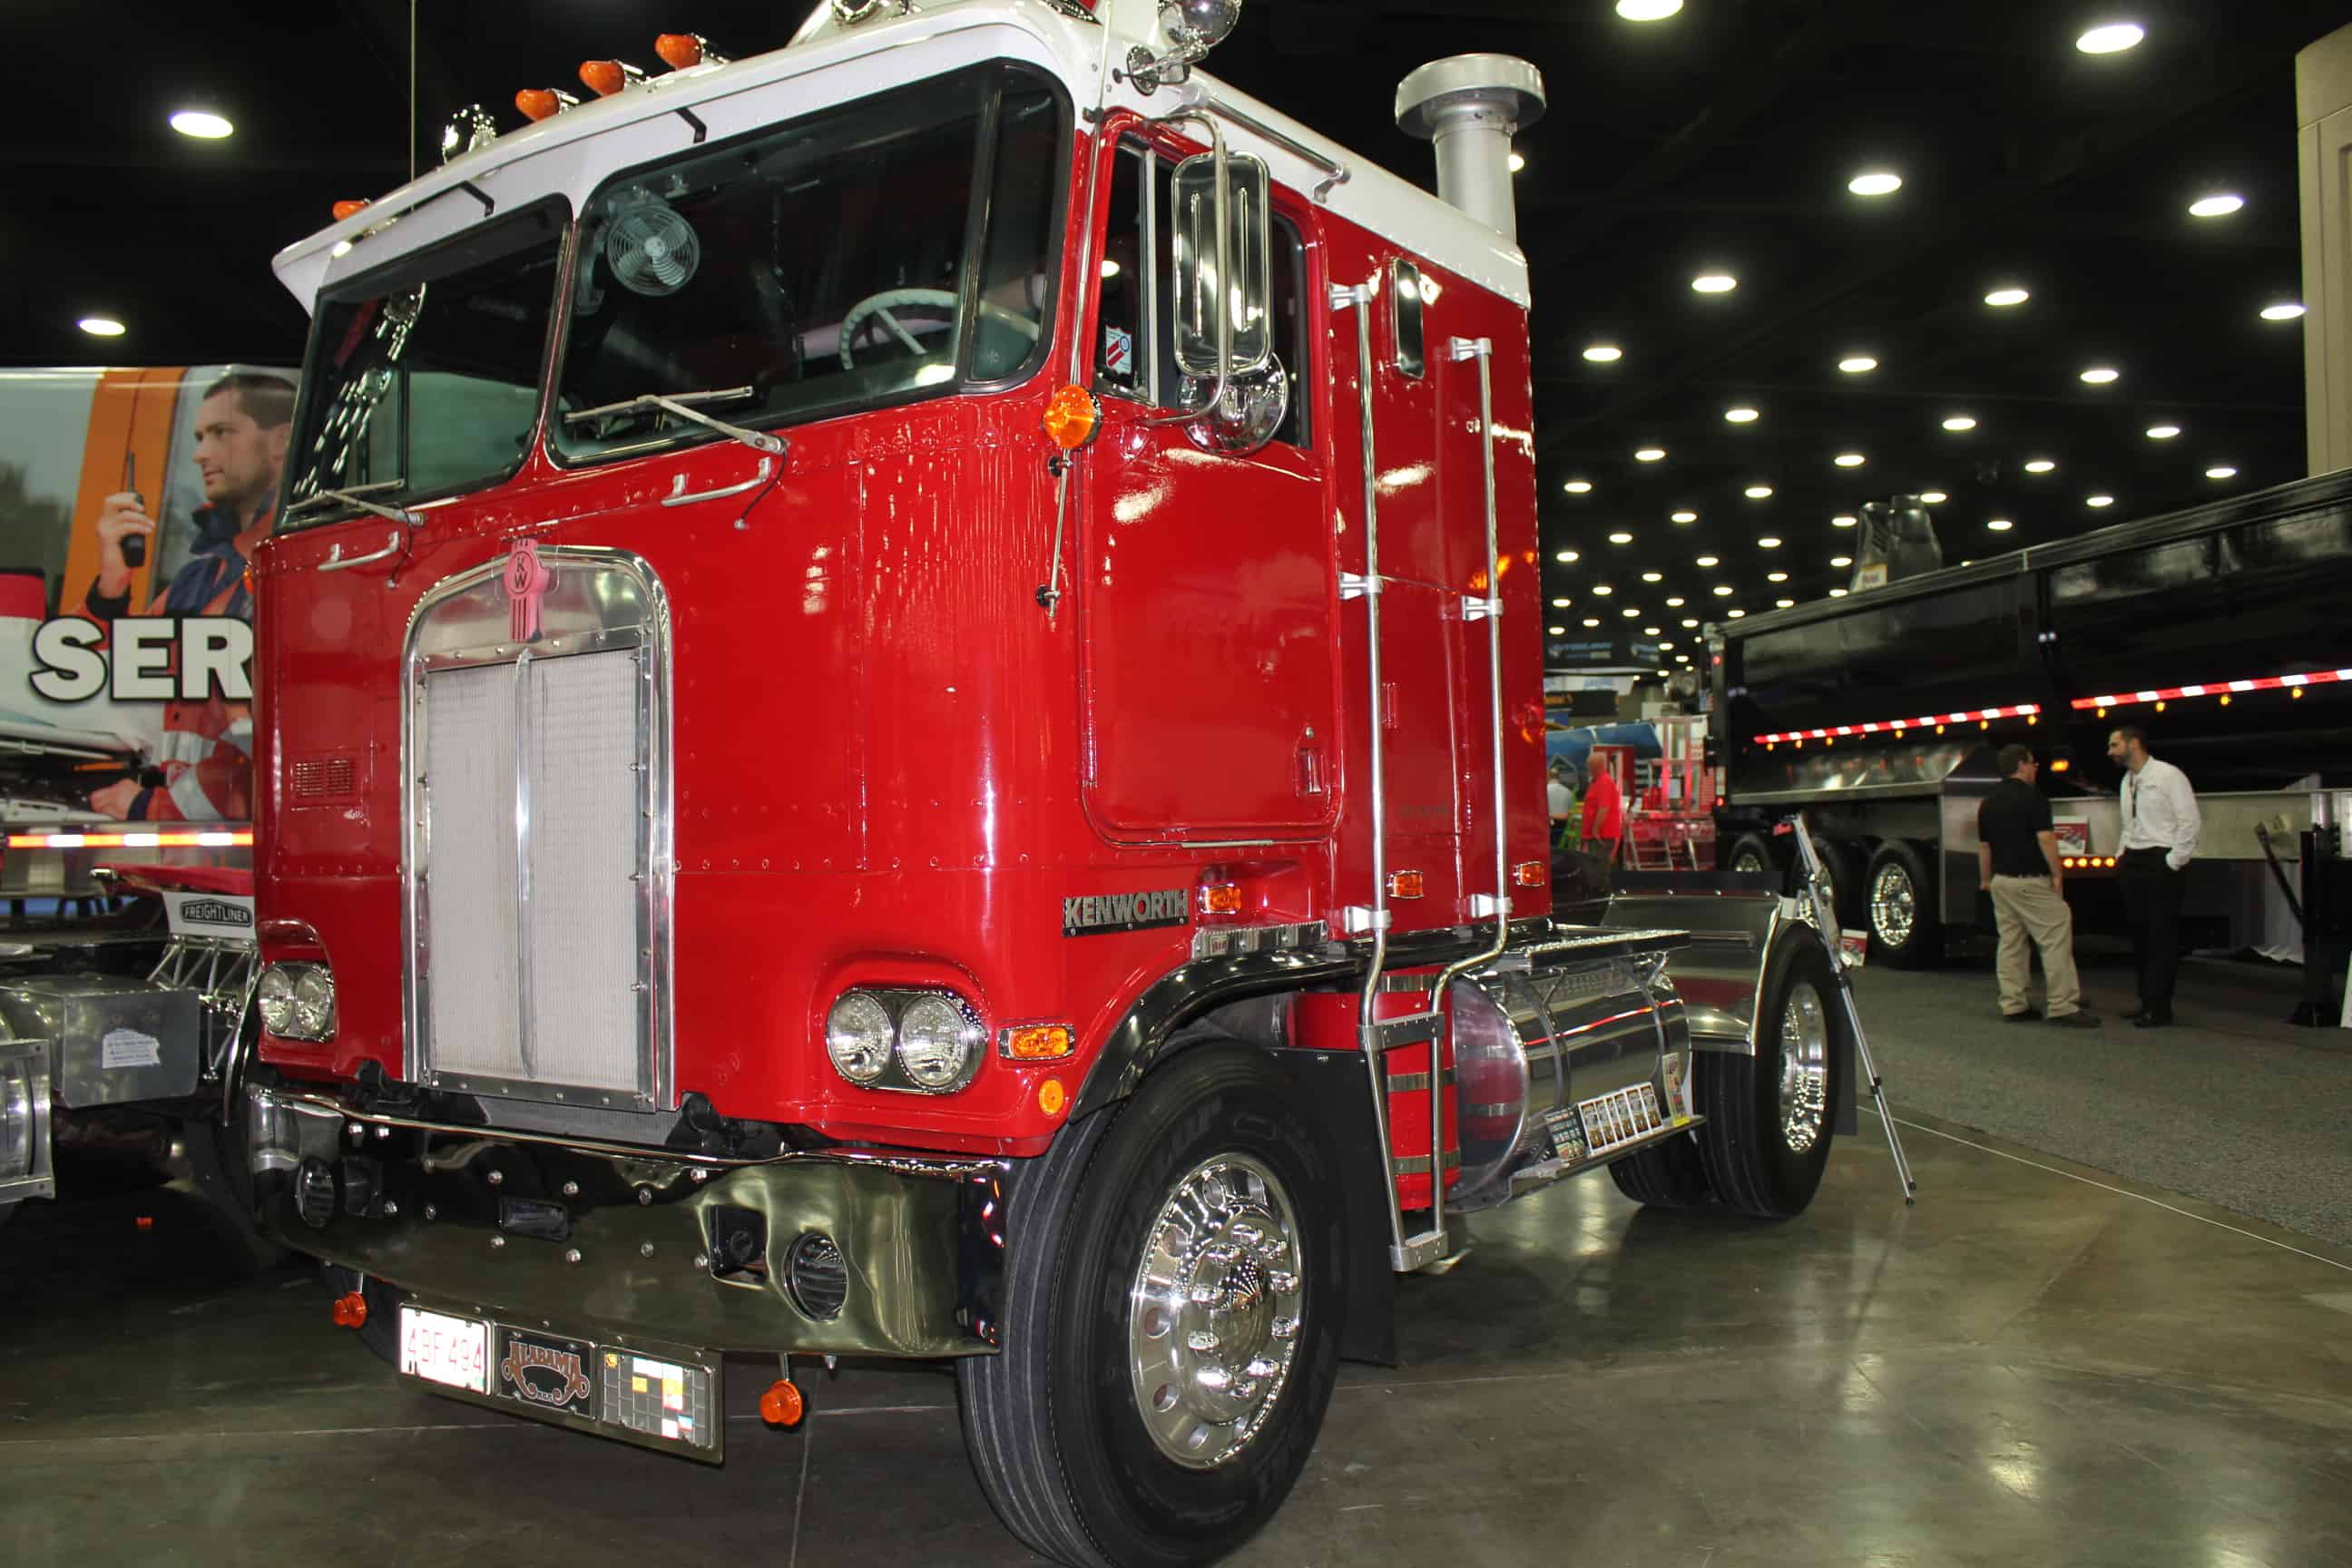 Old Red Kenworth Cabover Truck